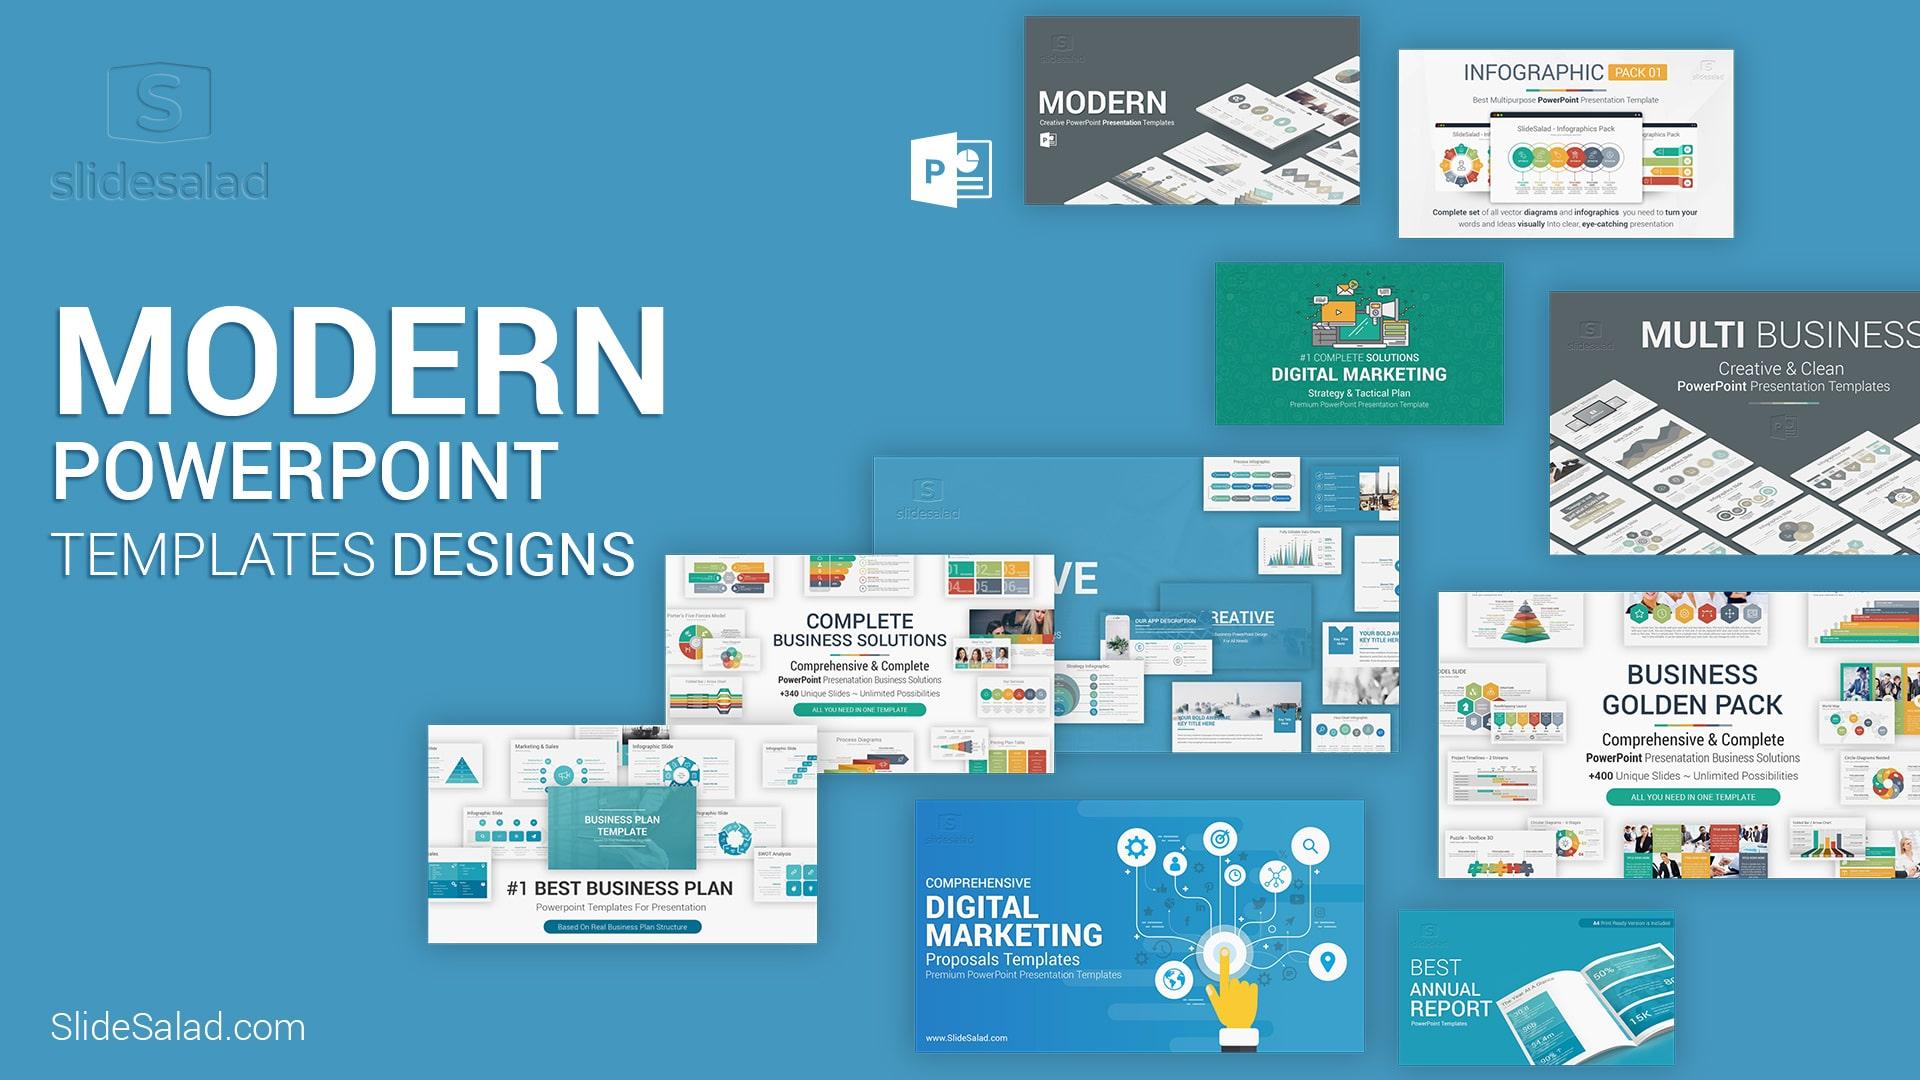 20 Modern Powerpoint Templates Presentations Design In 2021 Graphicgrand